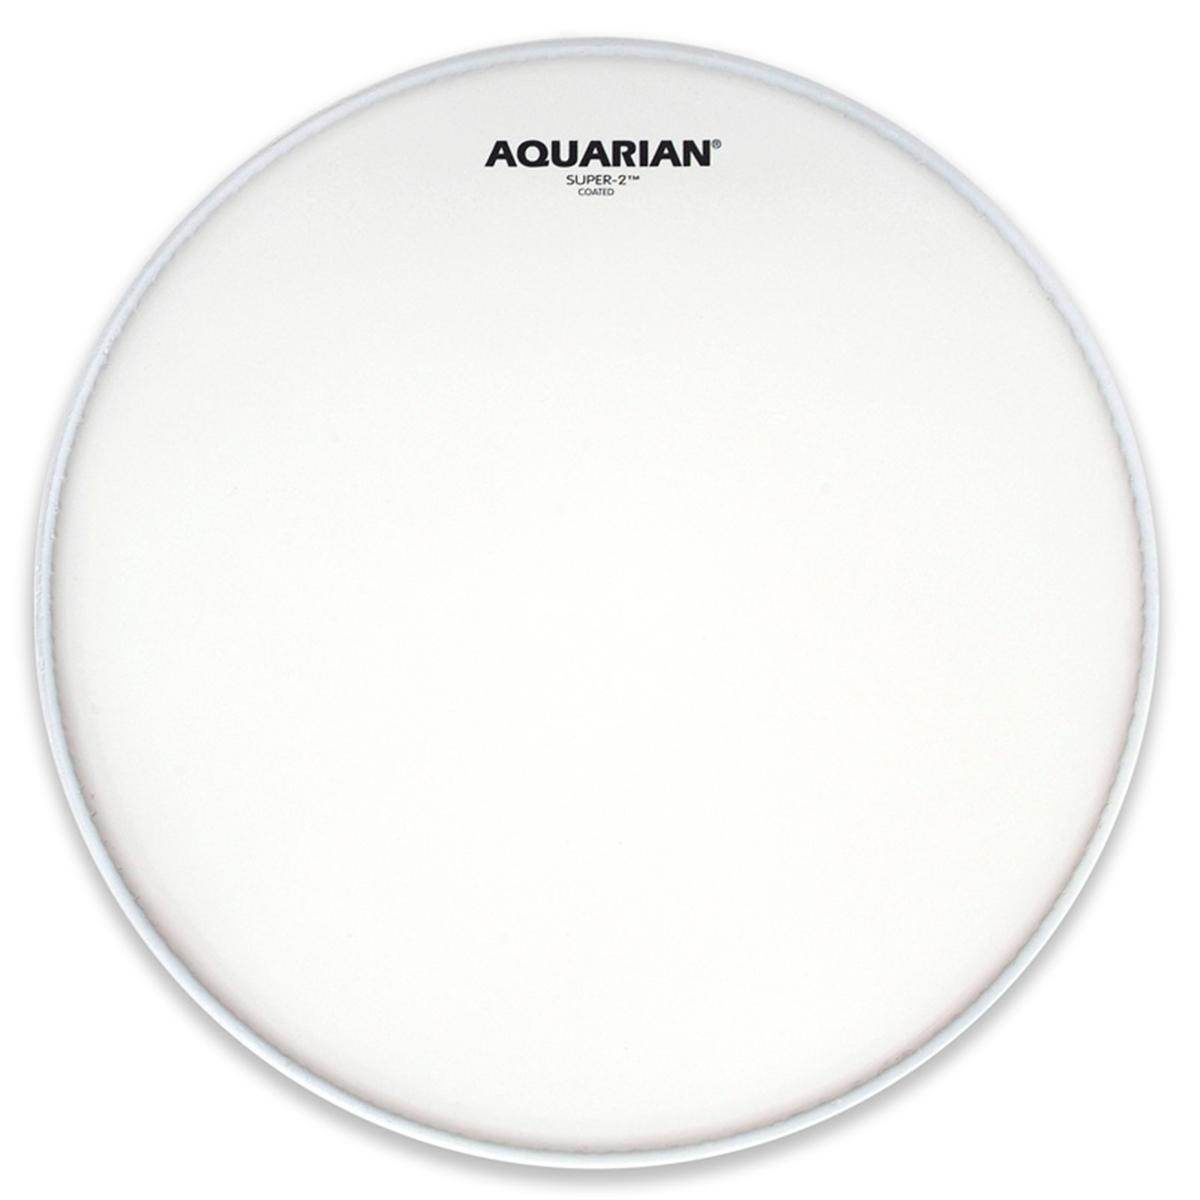 "Aquarian Super 2 Coated Drumhead (13"")"